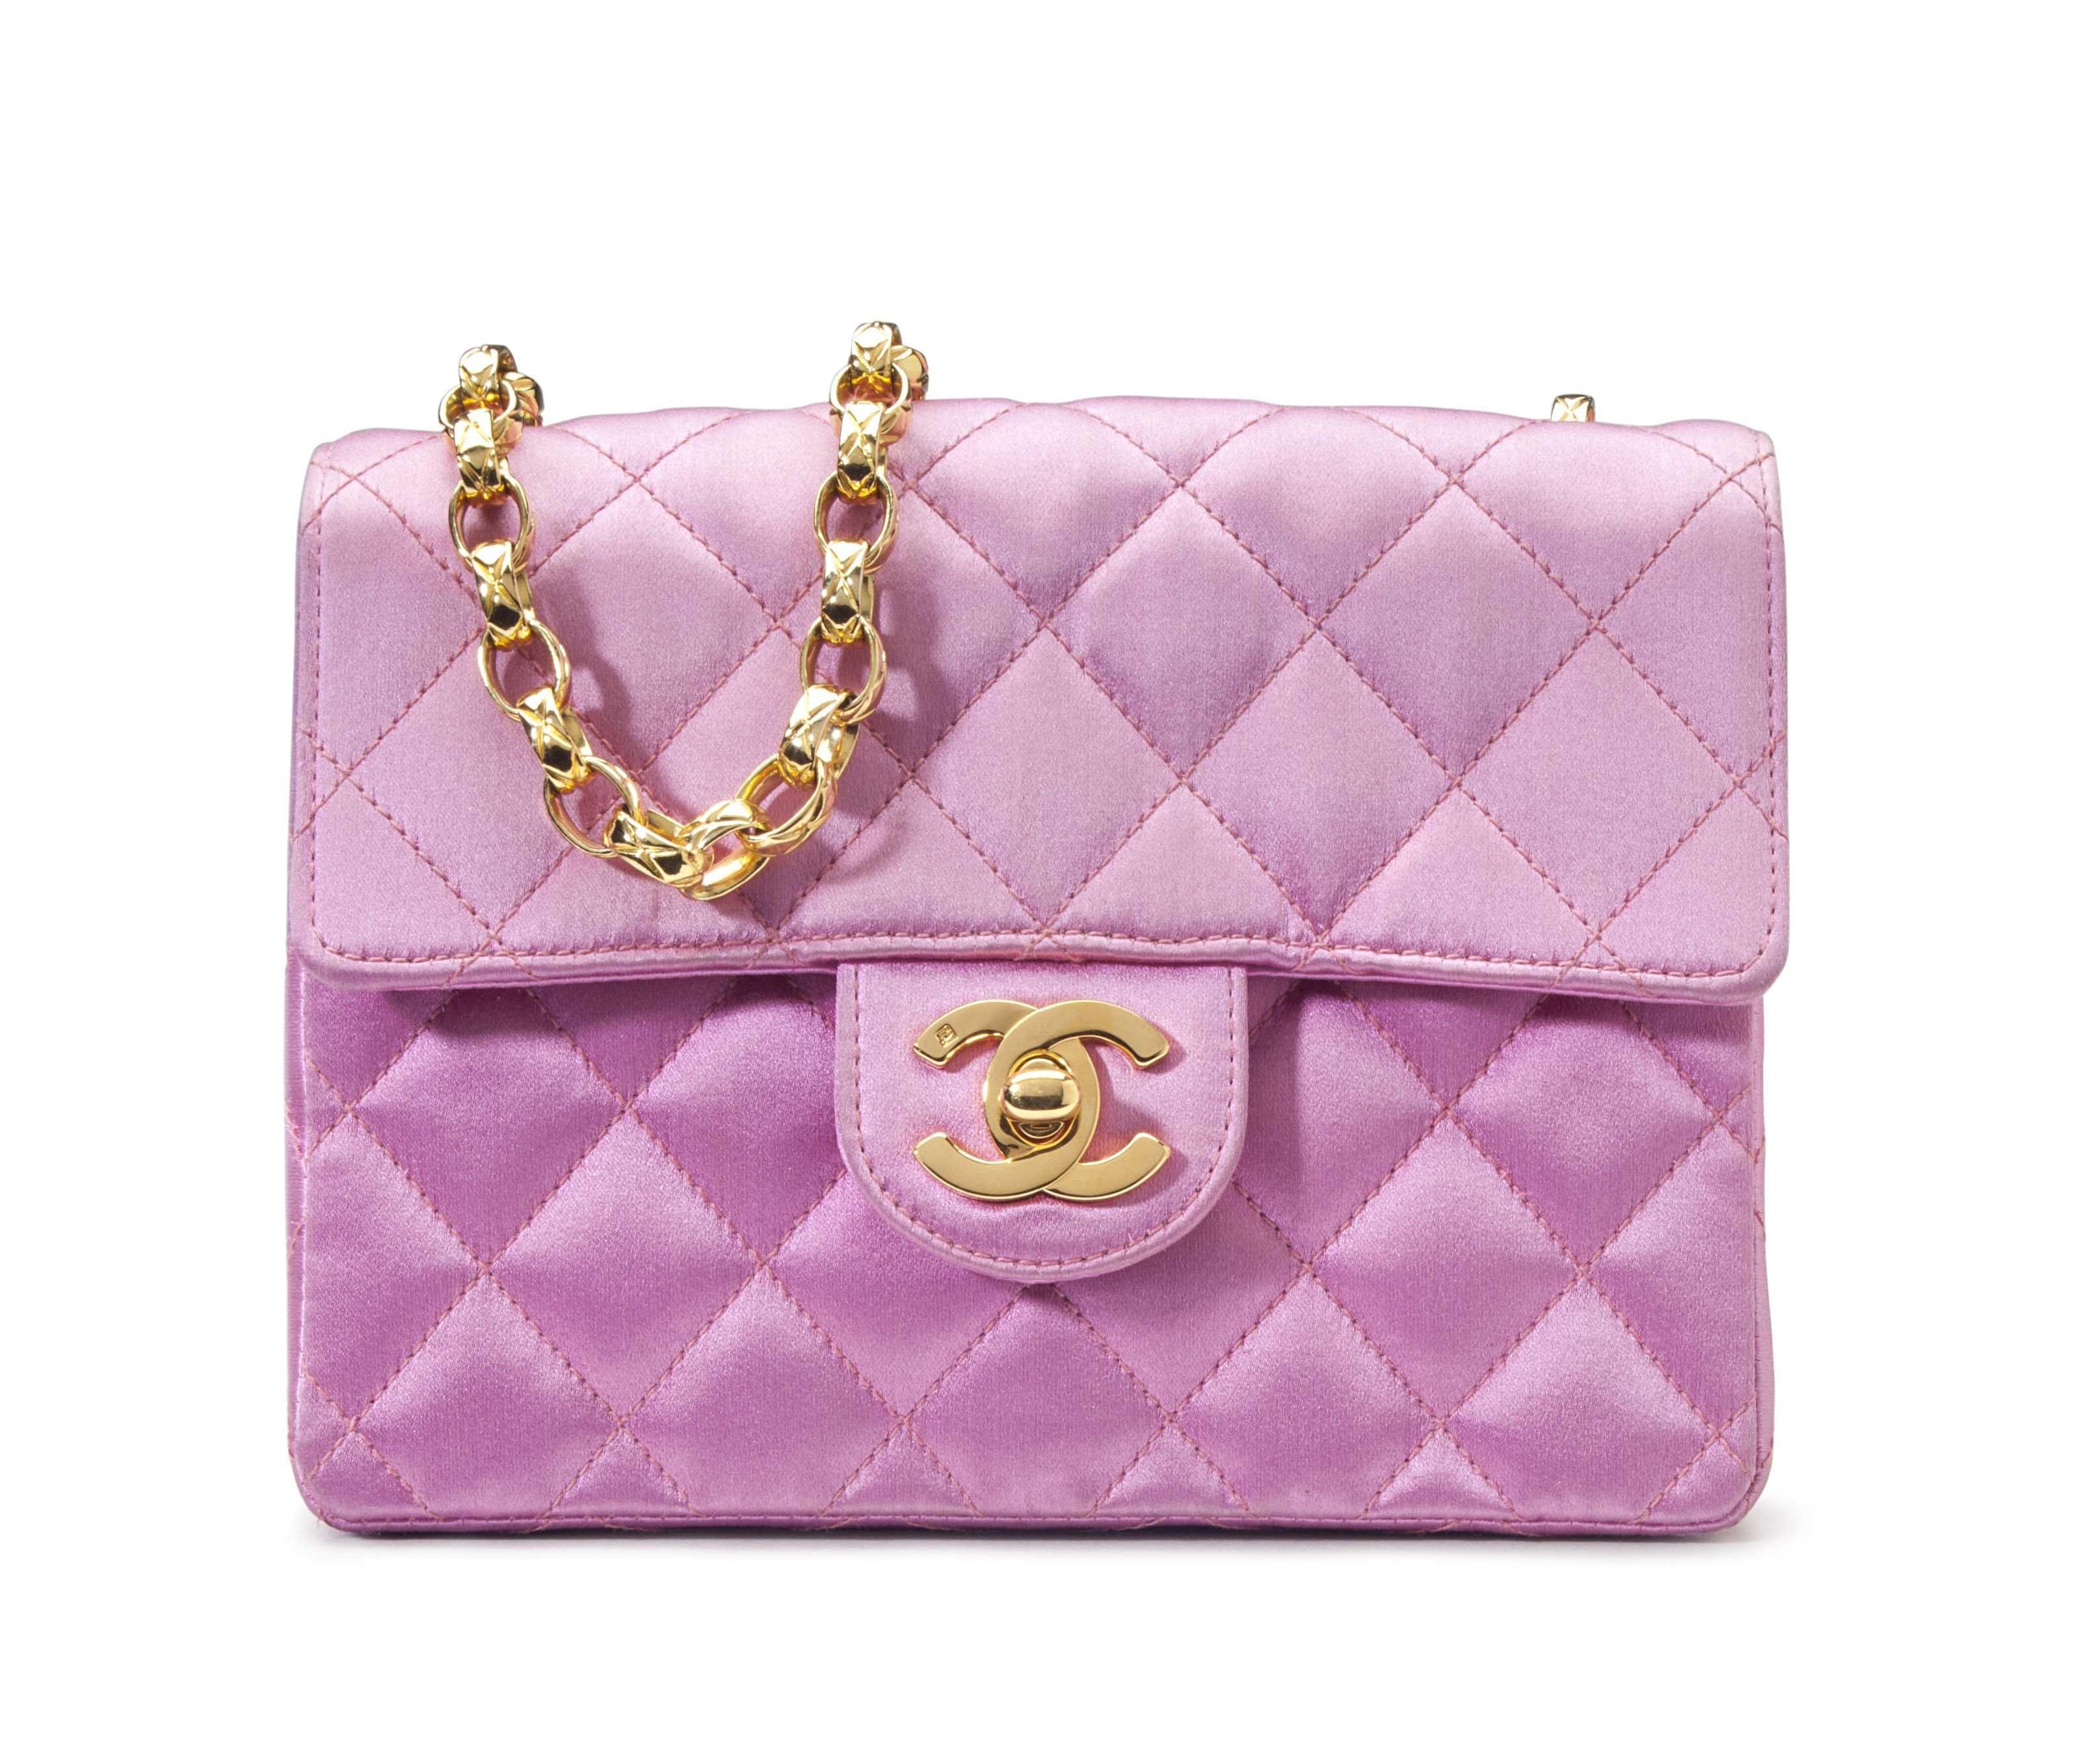 A Pink Satin Mini Flap Bag